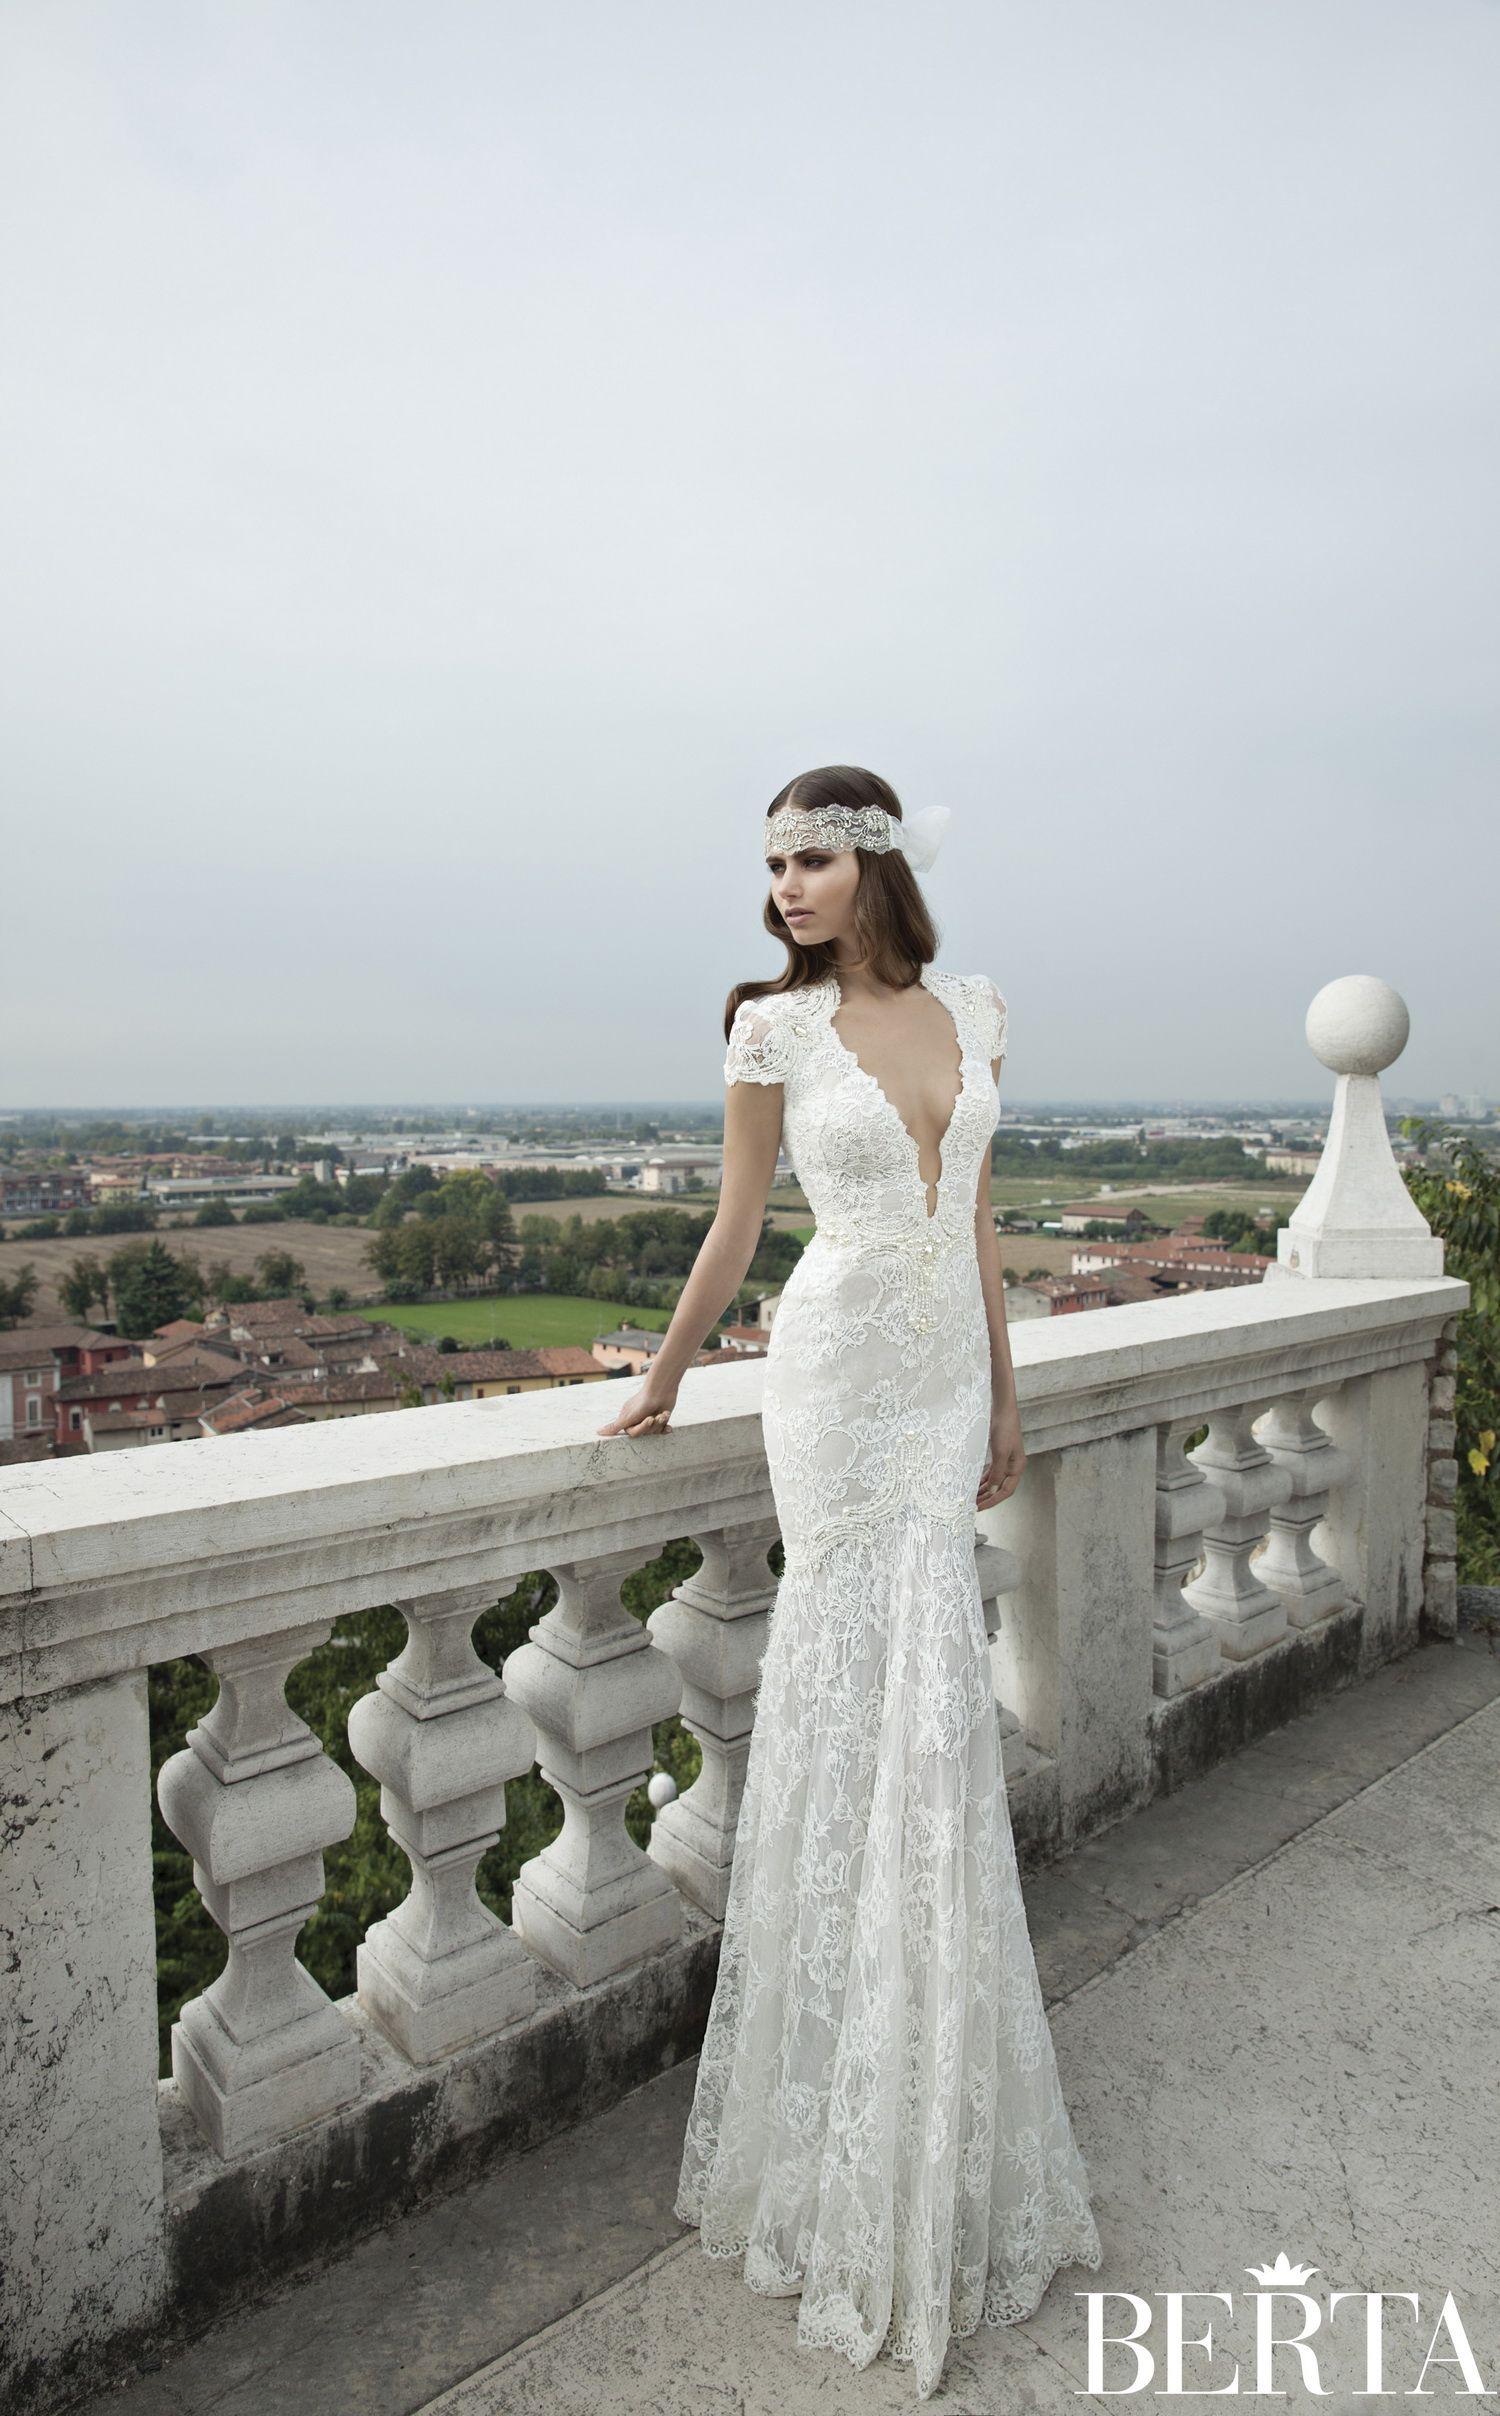 Berta Winter 2014 Bridal Collection | Bridal collection, Wedding ...